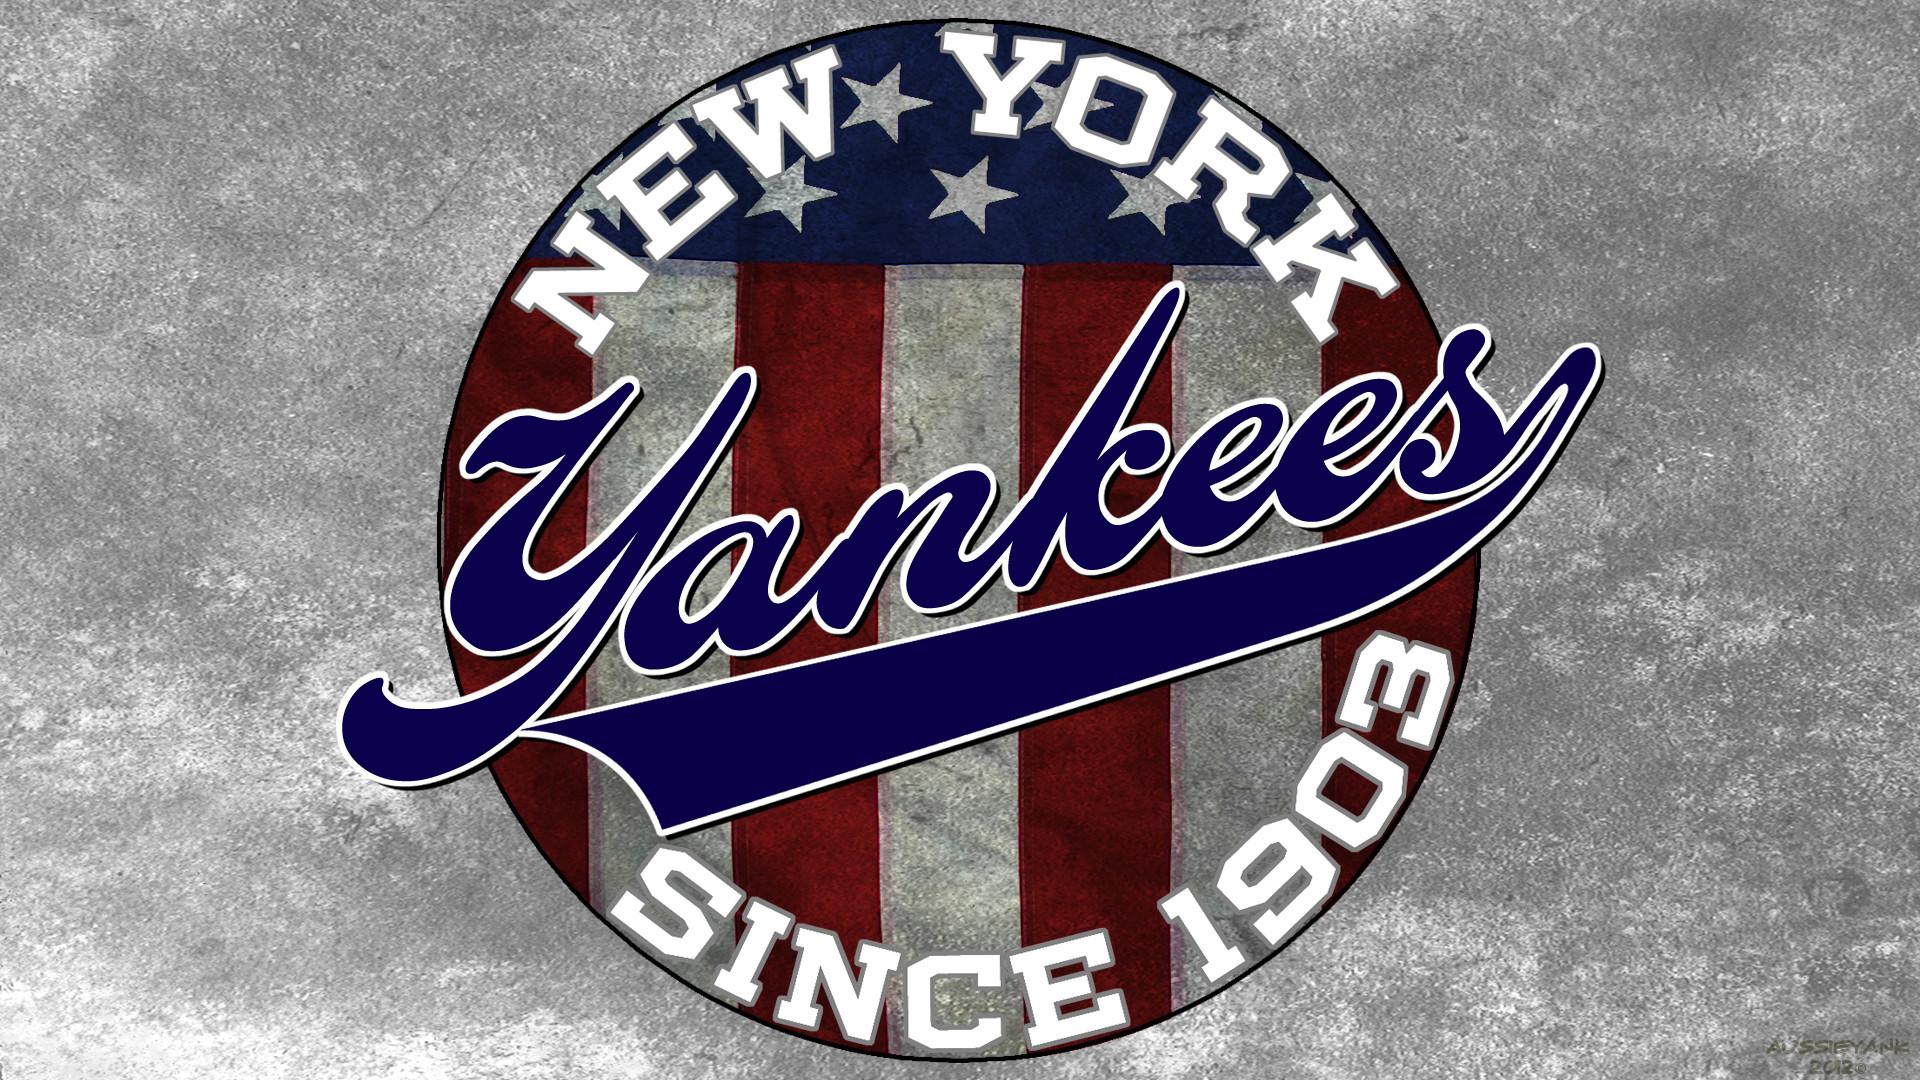 Yankees Wallpaper 1 1920×1080. View Full-Sized